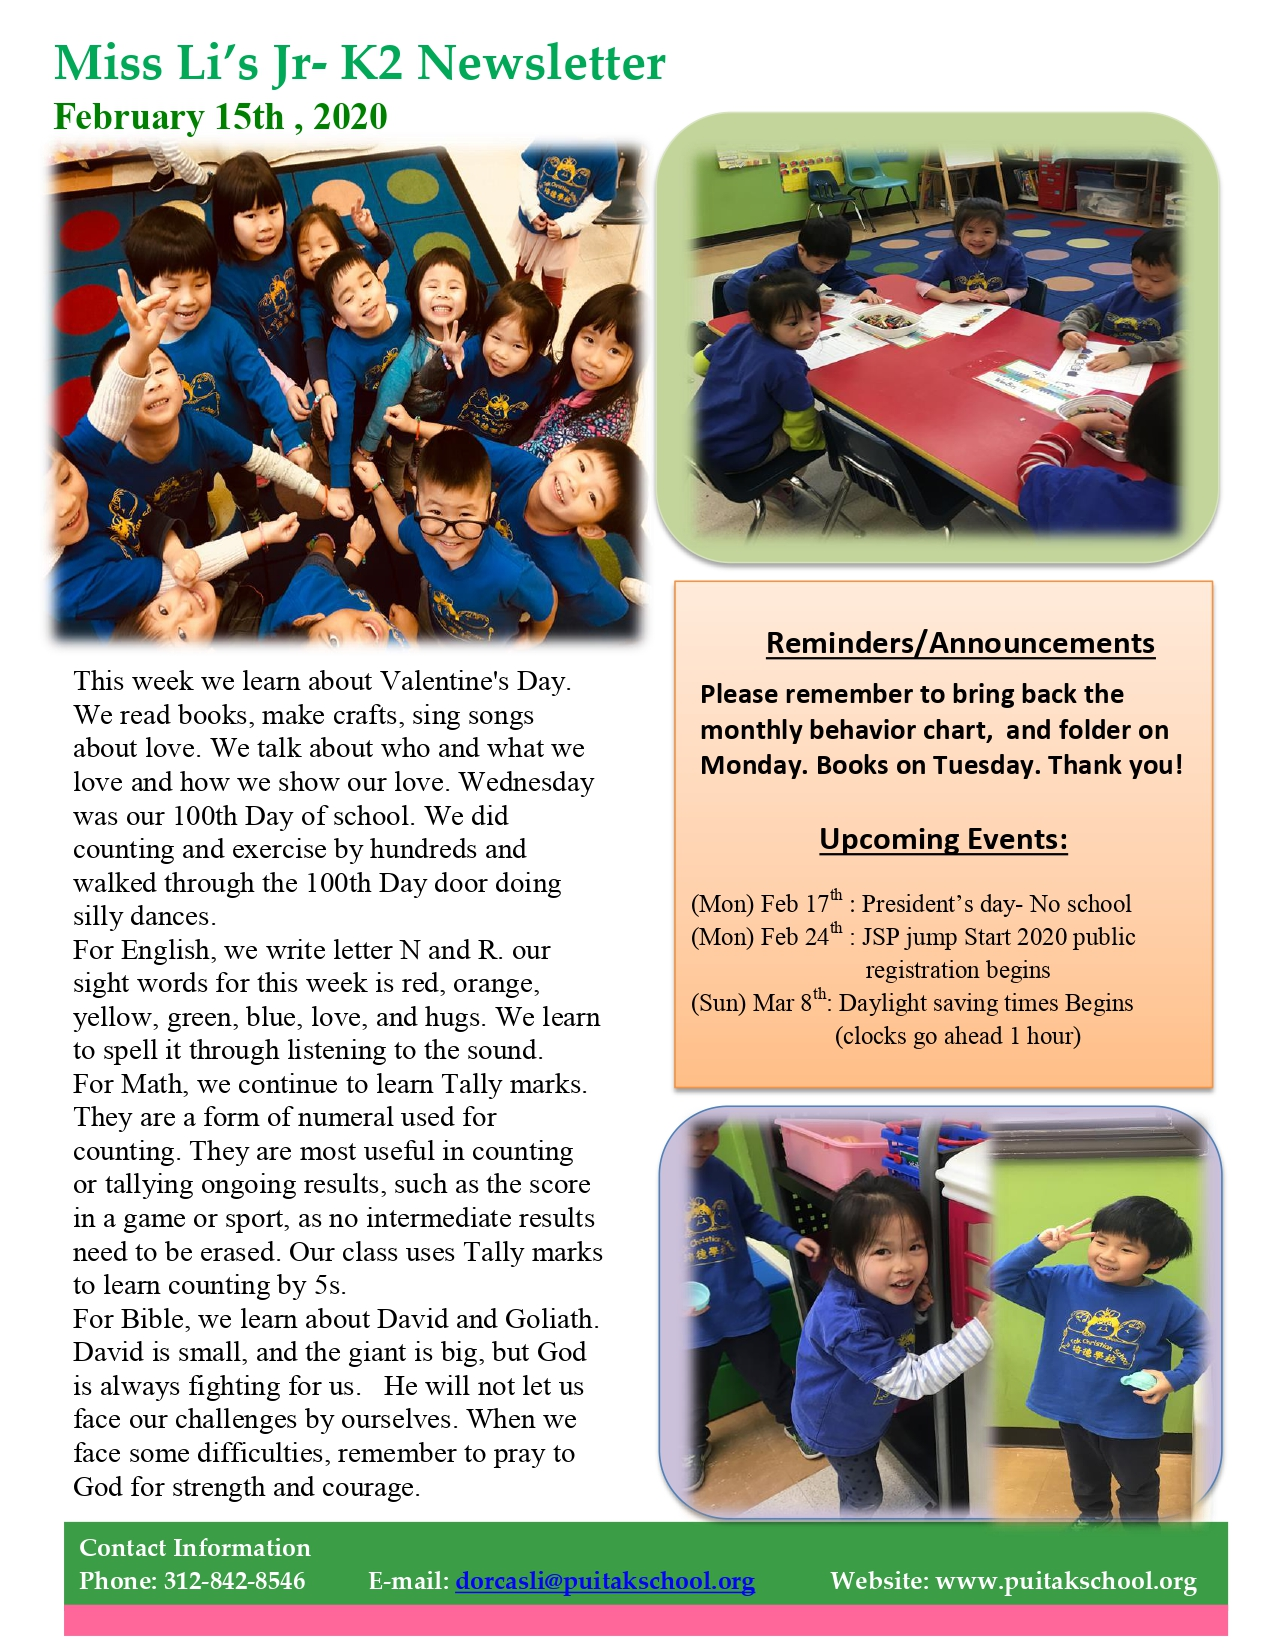 DorcasNewletter2020February2ndweek_page-